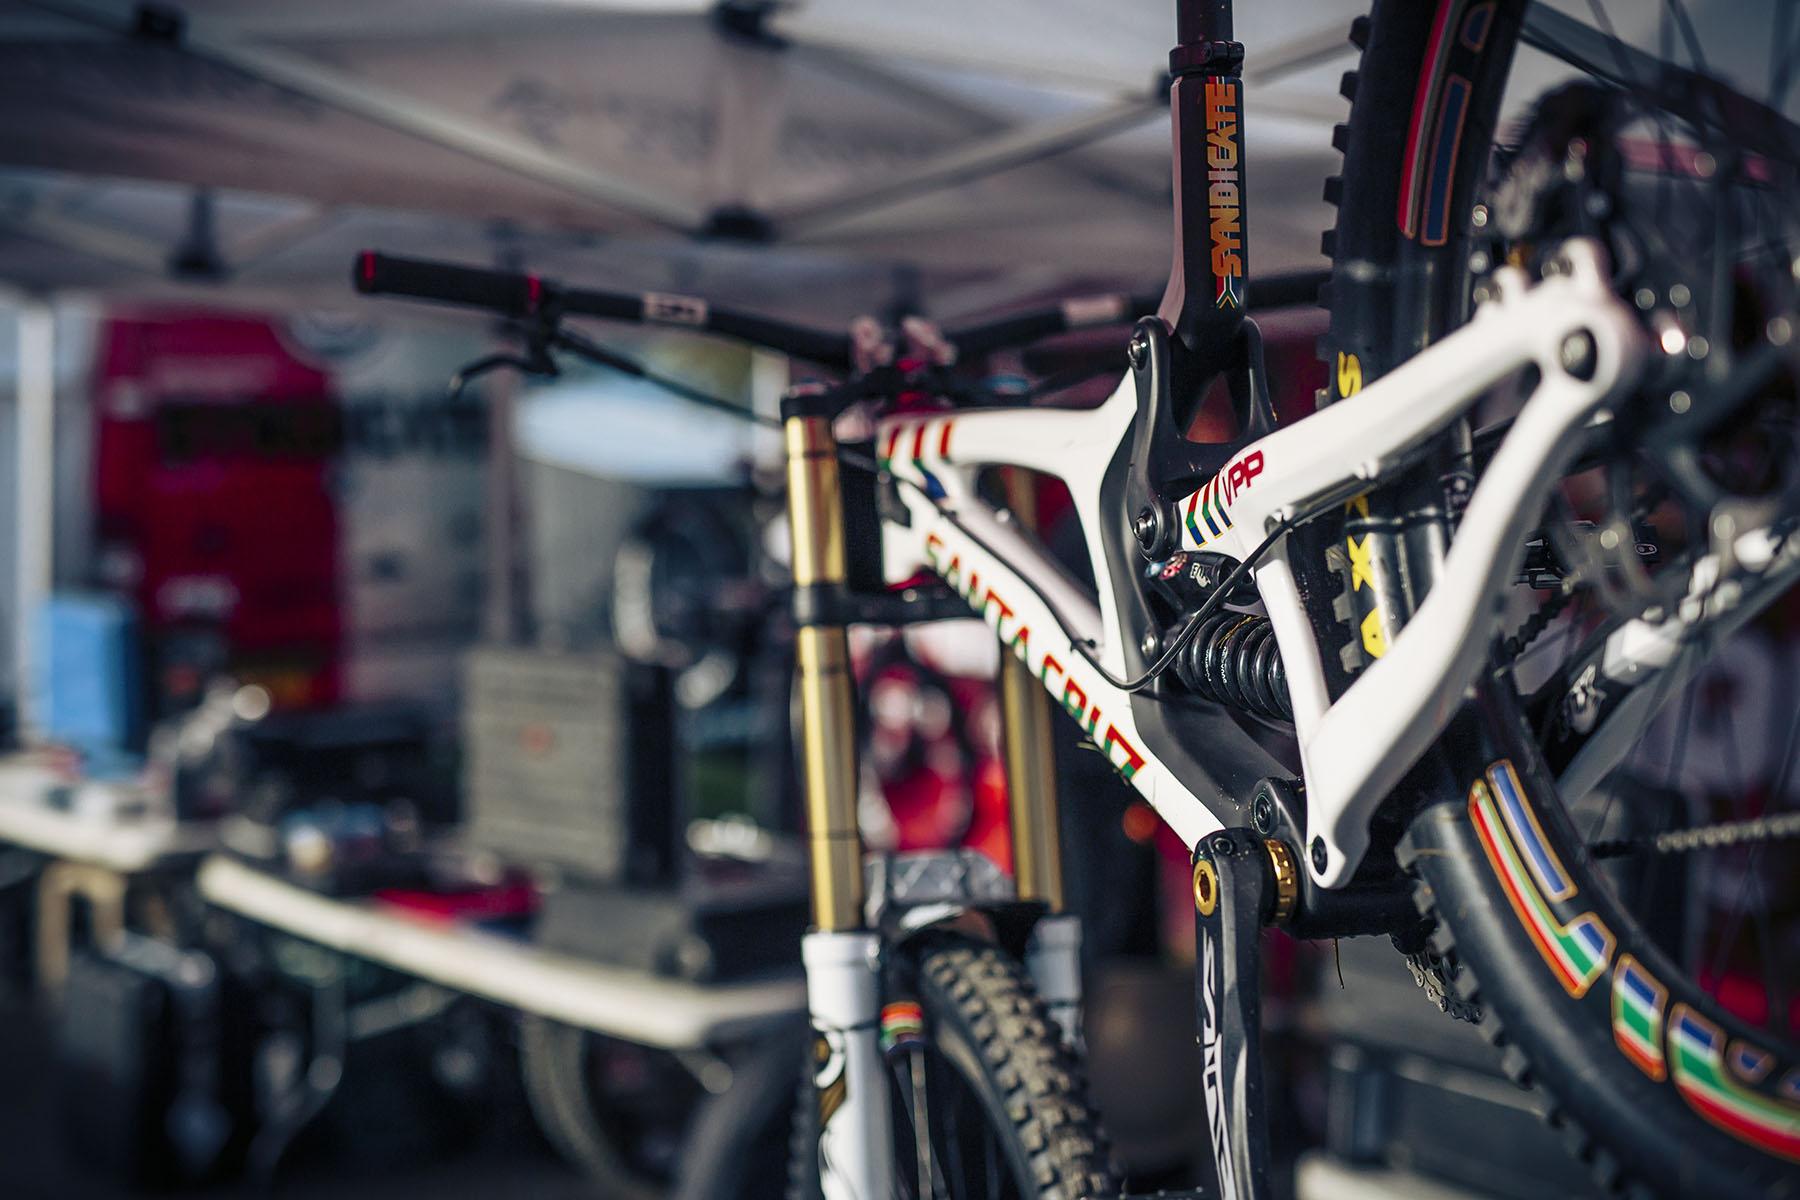 Überall schick lackierte World Champs bikes.